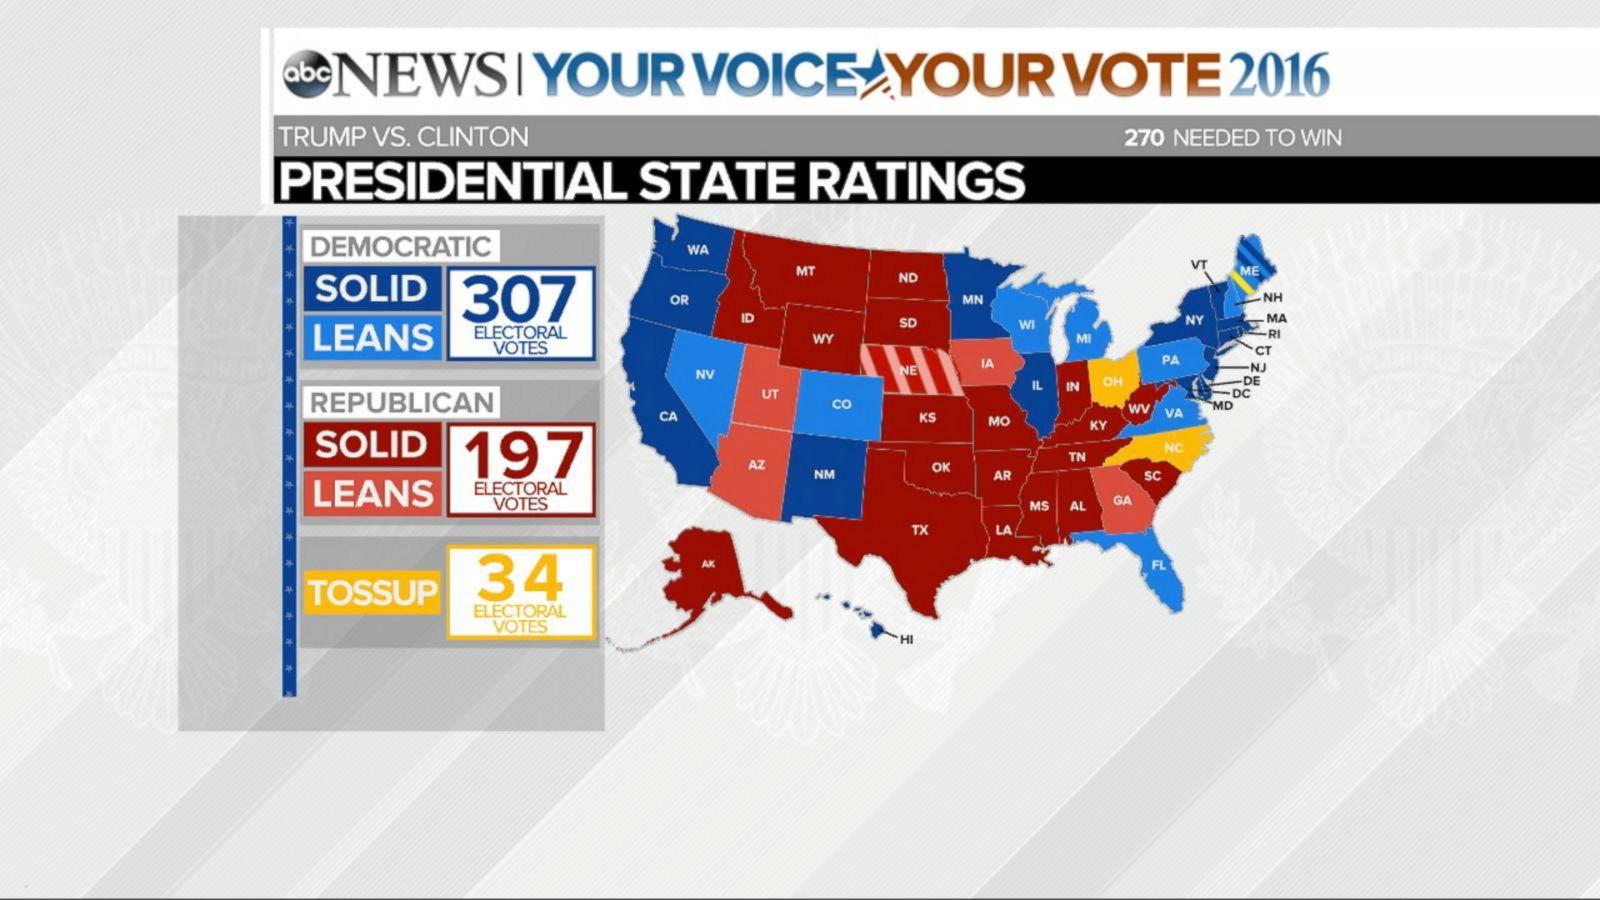 VIDEO: Clinton Campaign Expands Battleground Map